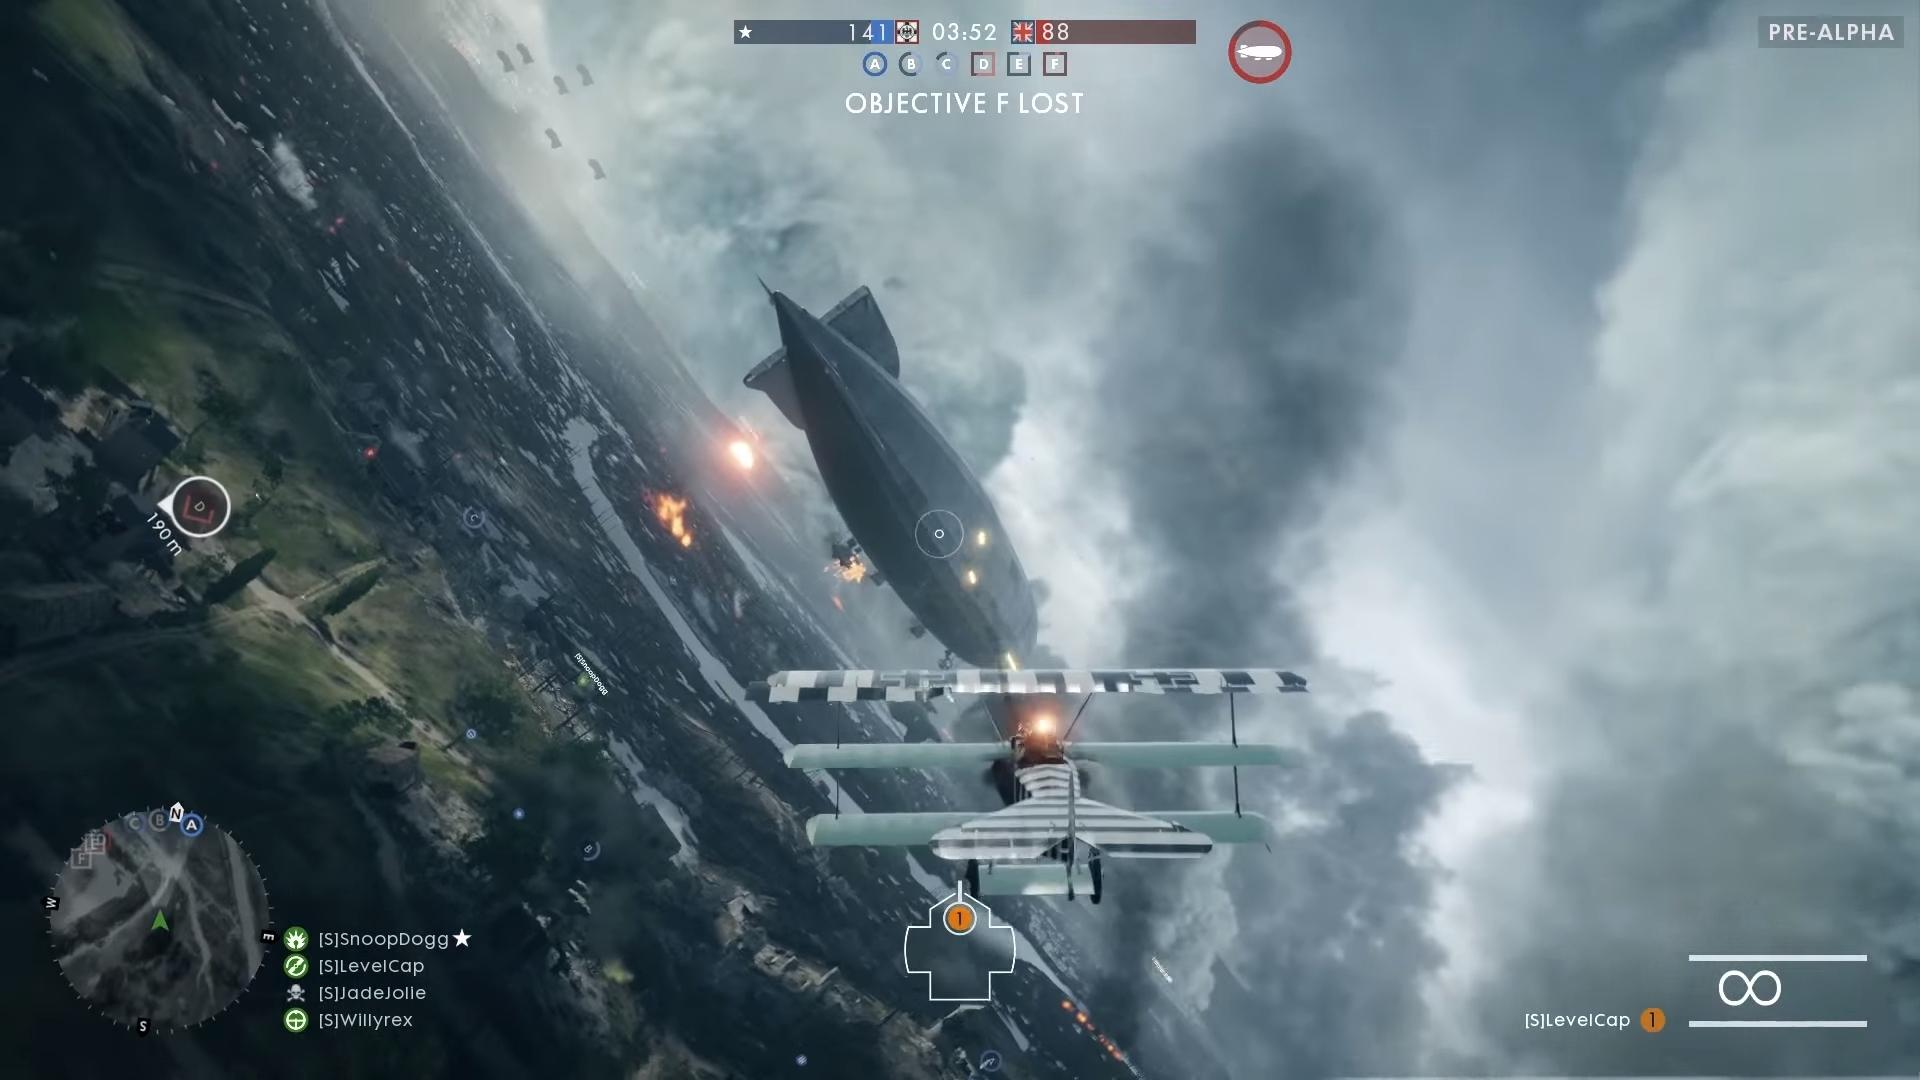 IMAGE(https://cheapdigitaldownload.com/wp-content/uploads/Battlefield-1-fighterplane-1.jpg)